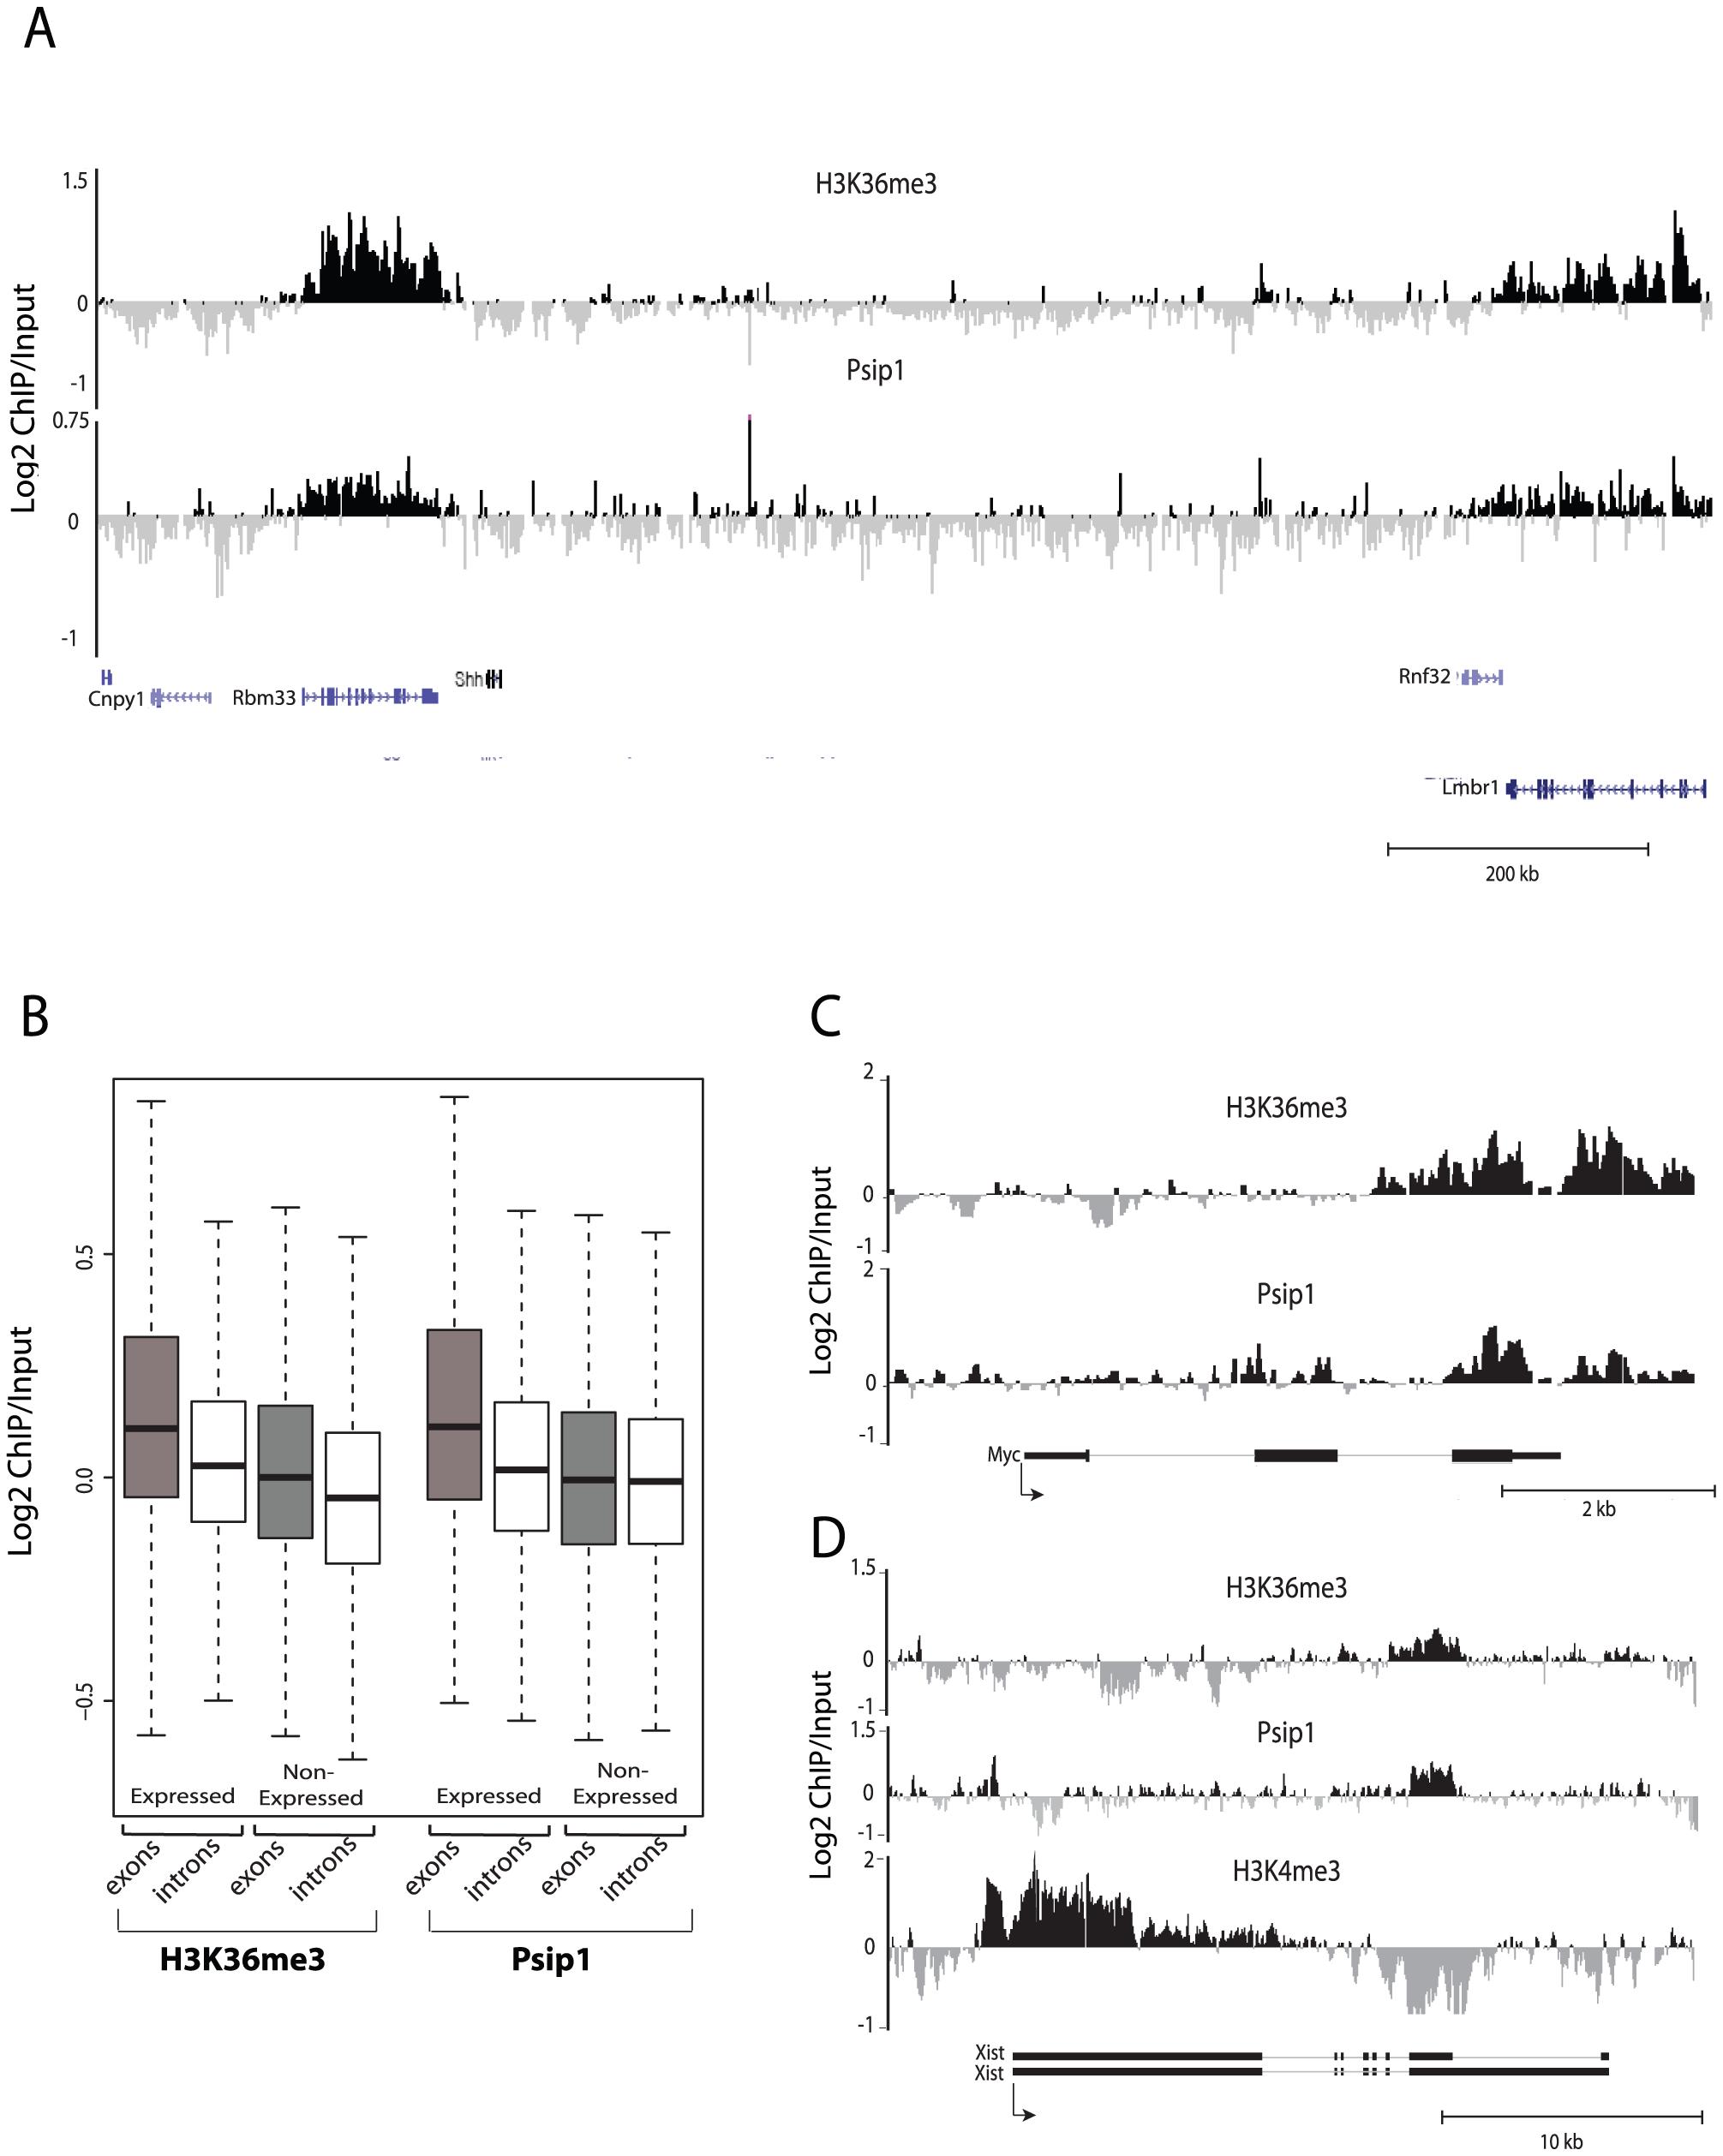 Genomic distribution of Psip1/p52 and H3K36me3.